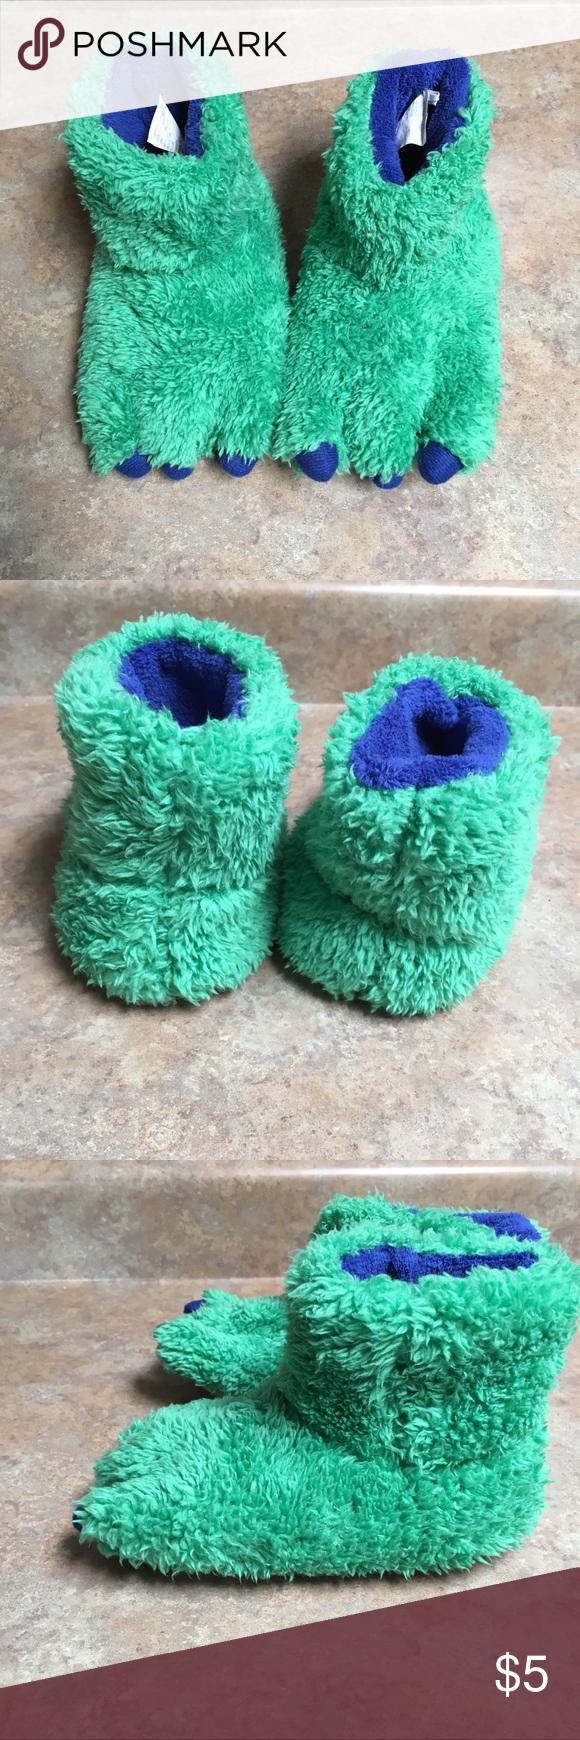 Kids Target Monster foot slippers